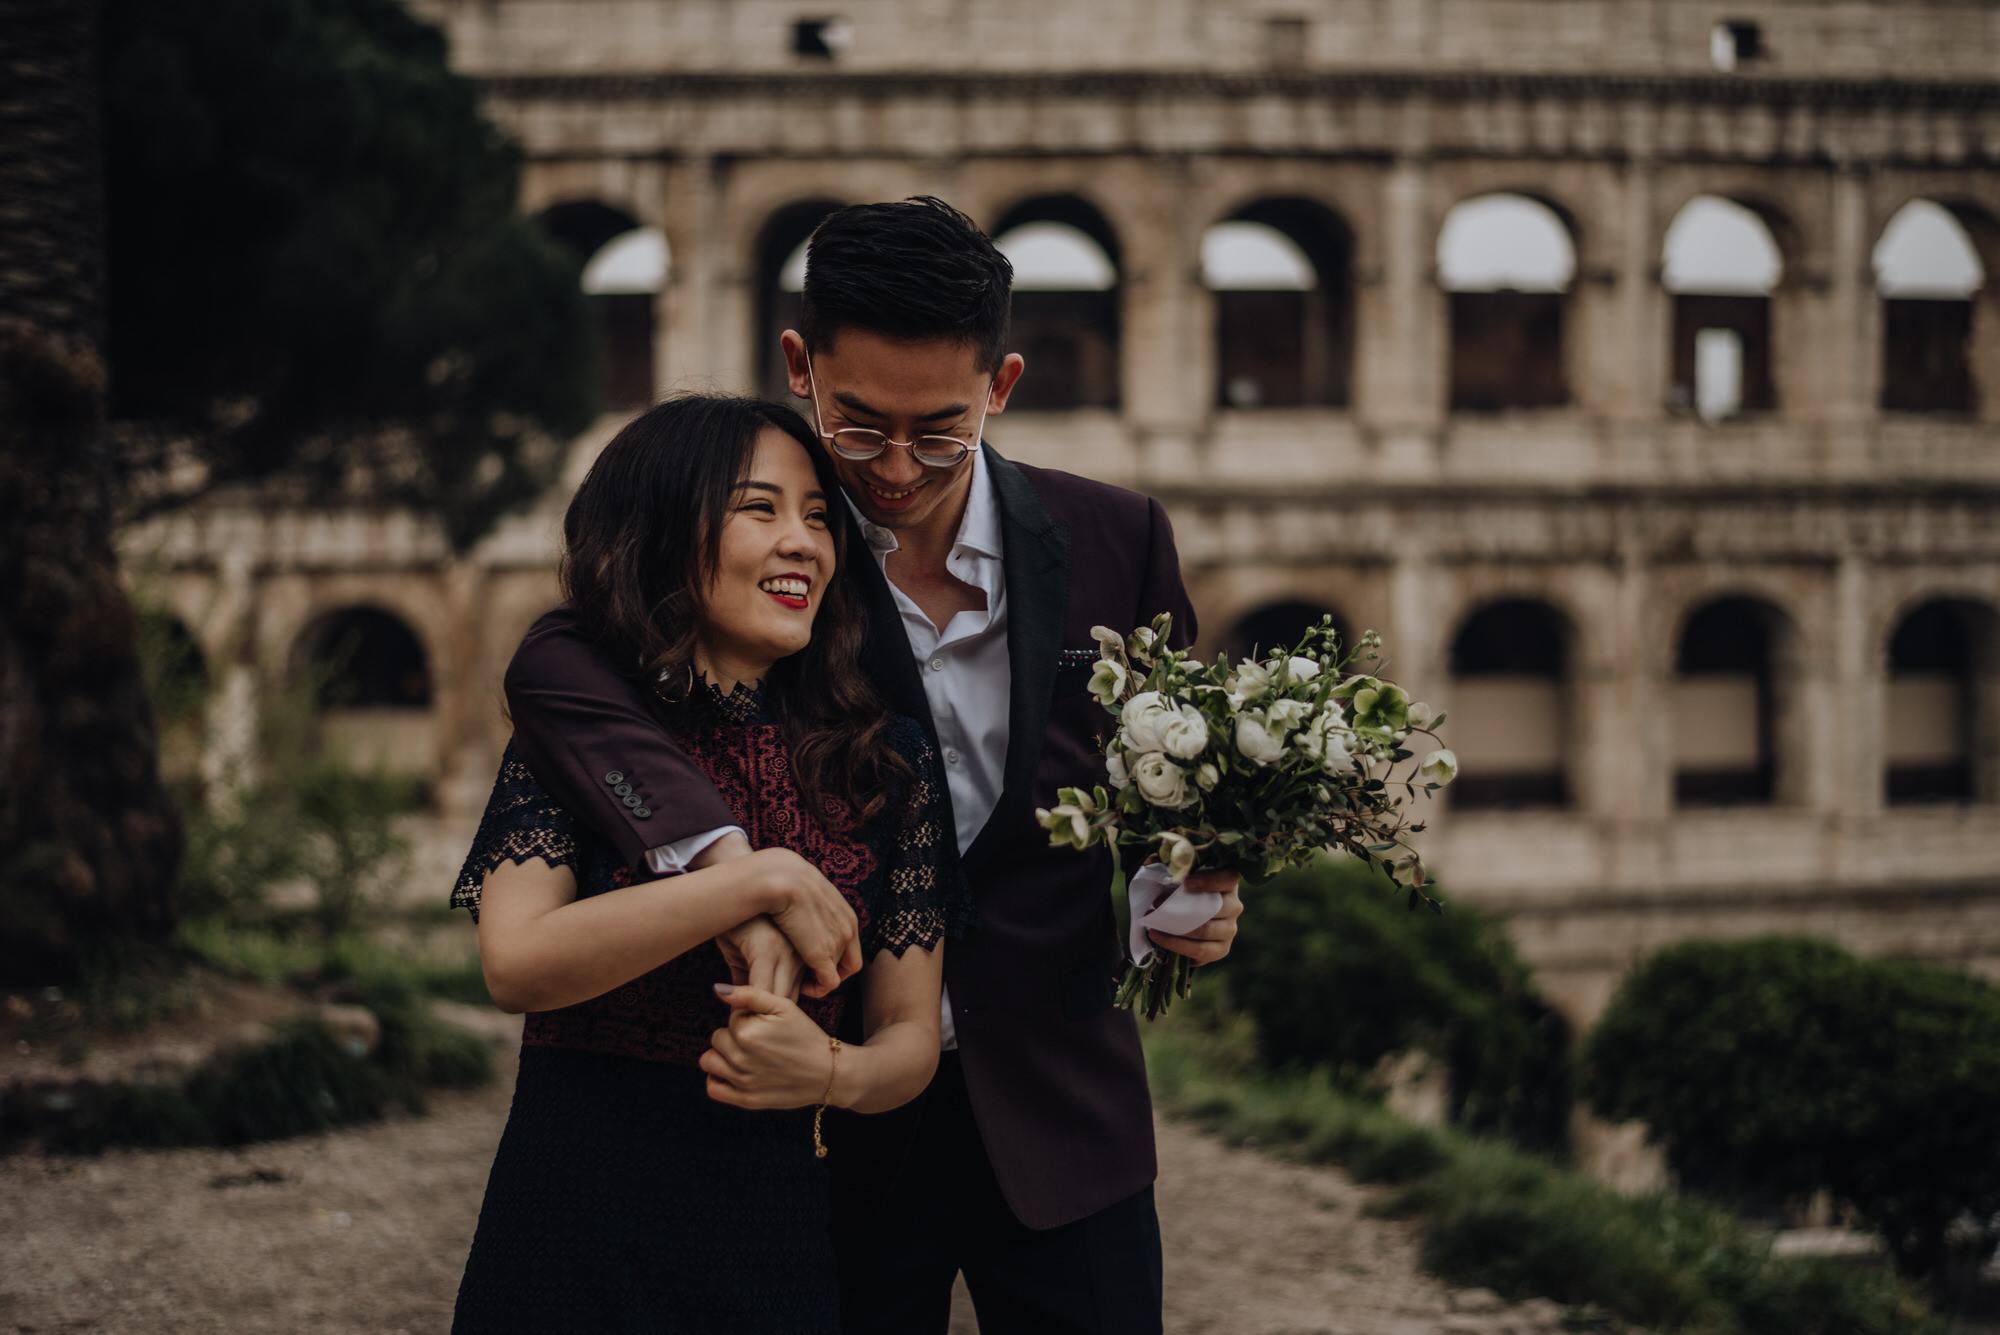 Surprise-proposal-Rome-JackyMary_AmorVincitOmnia-18